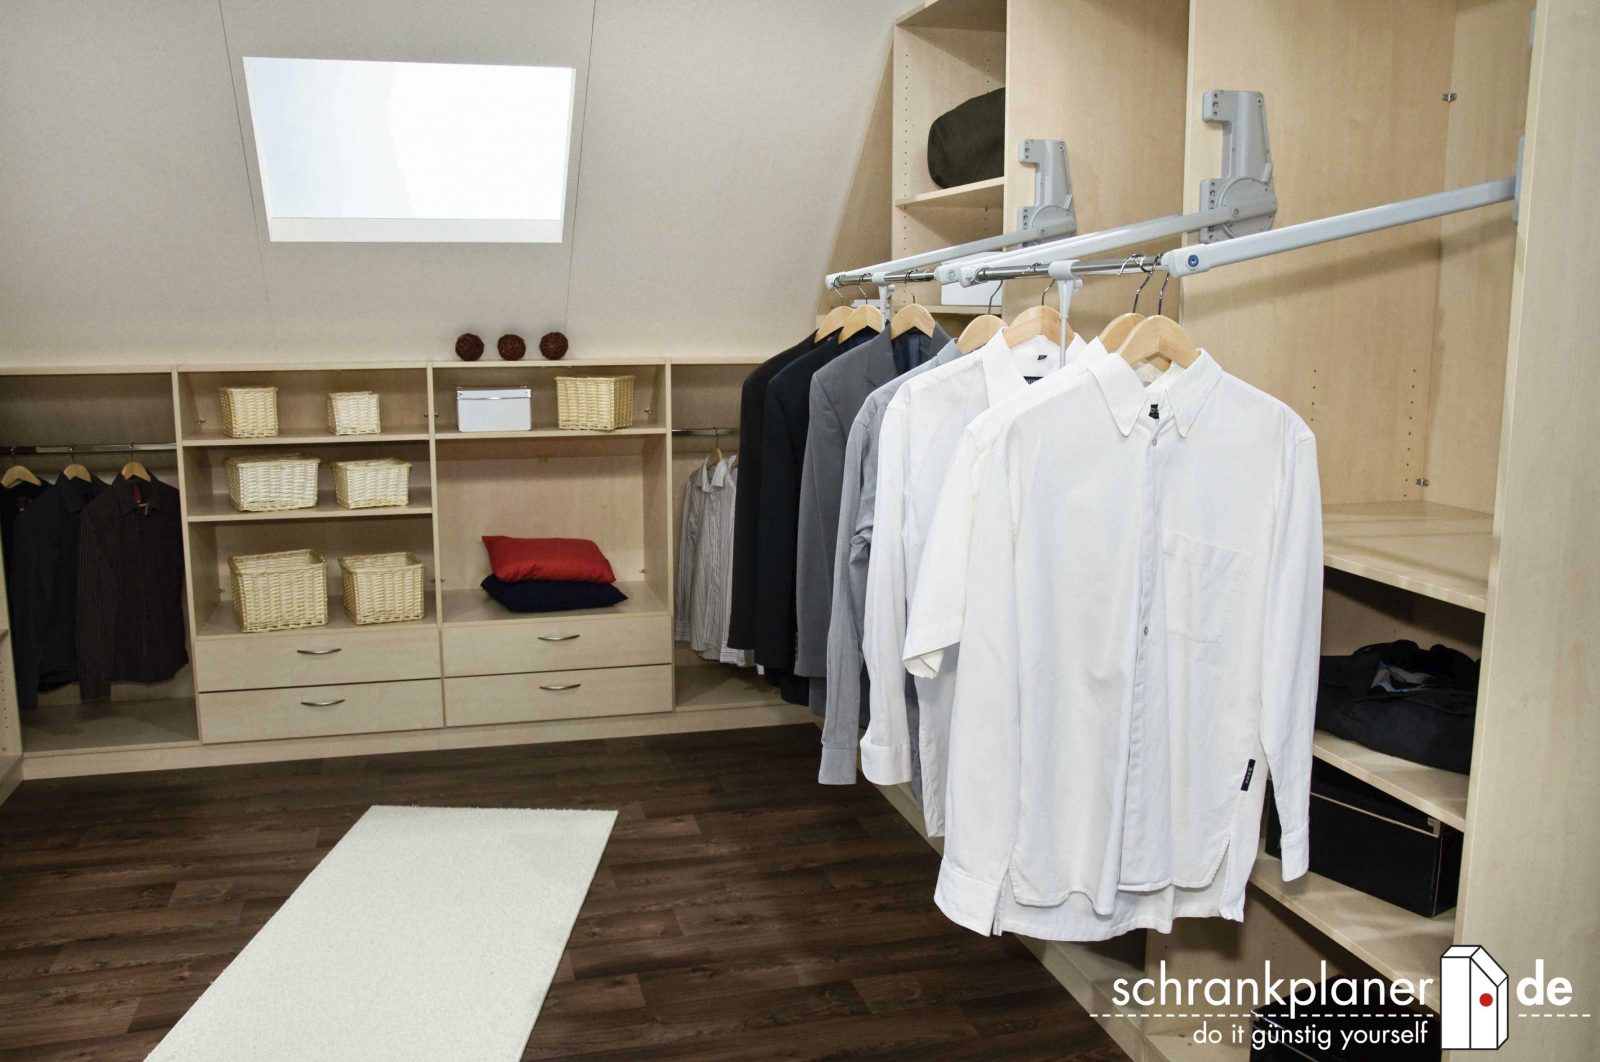 Elegantes Wandschrank Selber Bauen 20 Bilder Begehbarer von Kleiderschrank Selber Bauen Kosten Bild